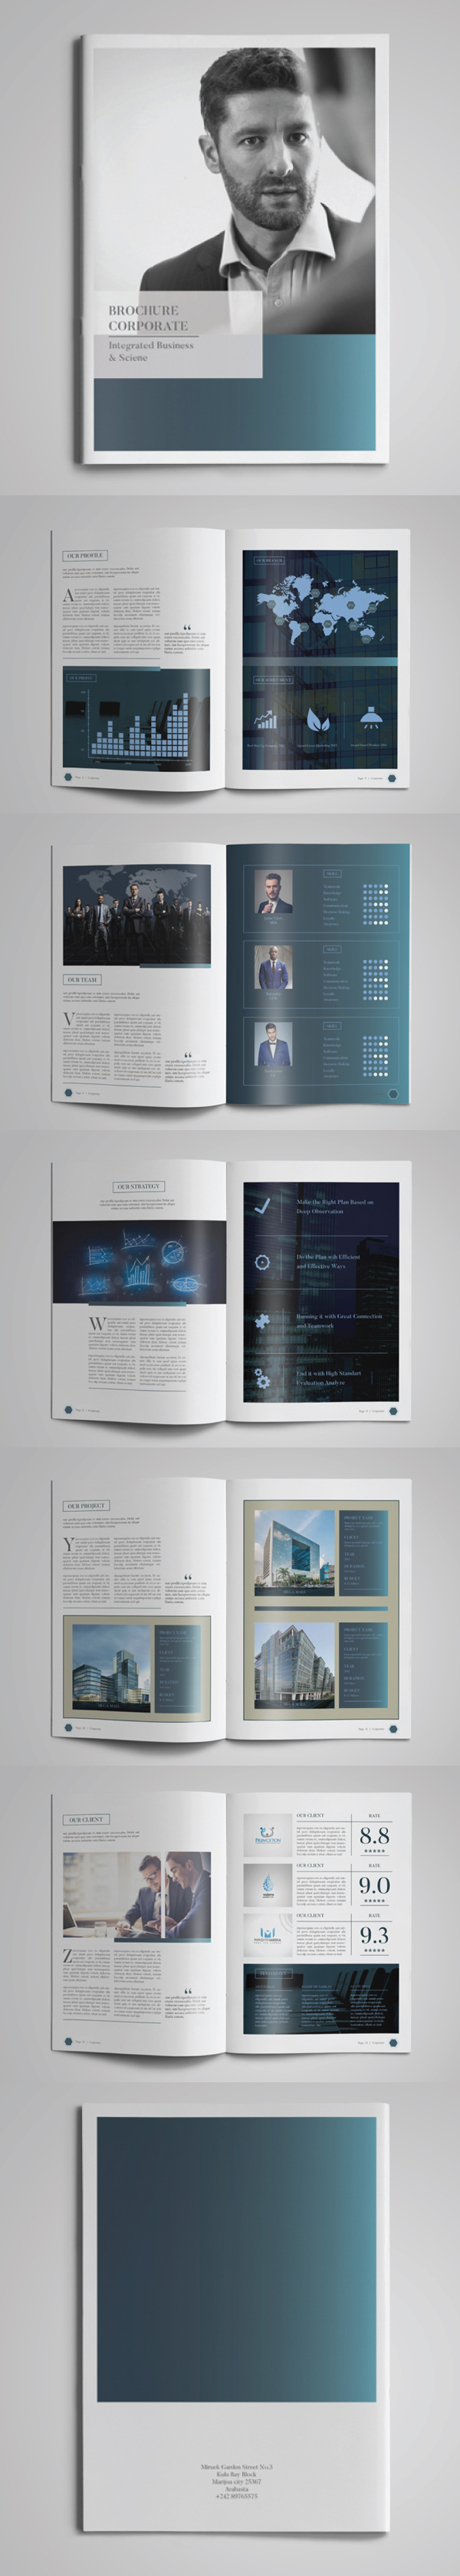 100 Professional Corporate Brochure Templates - 5